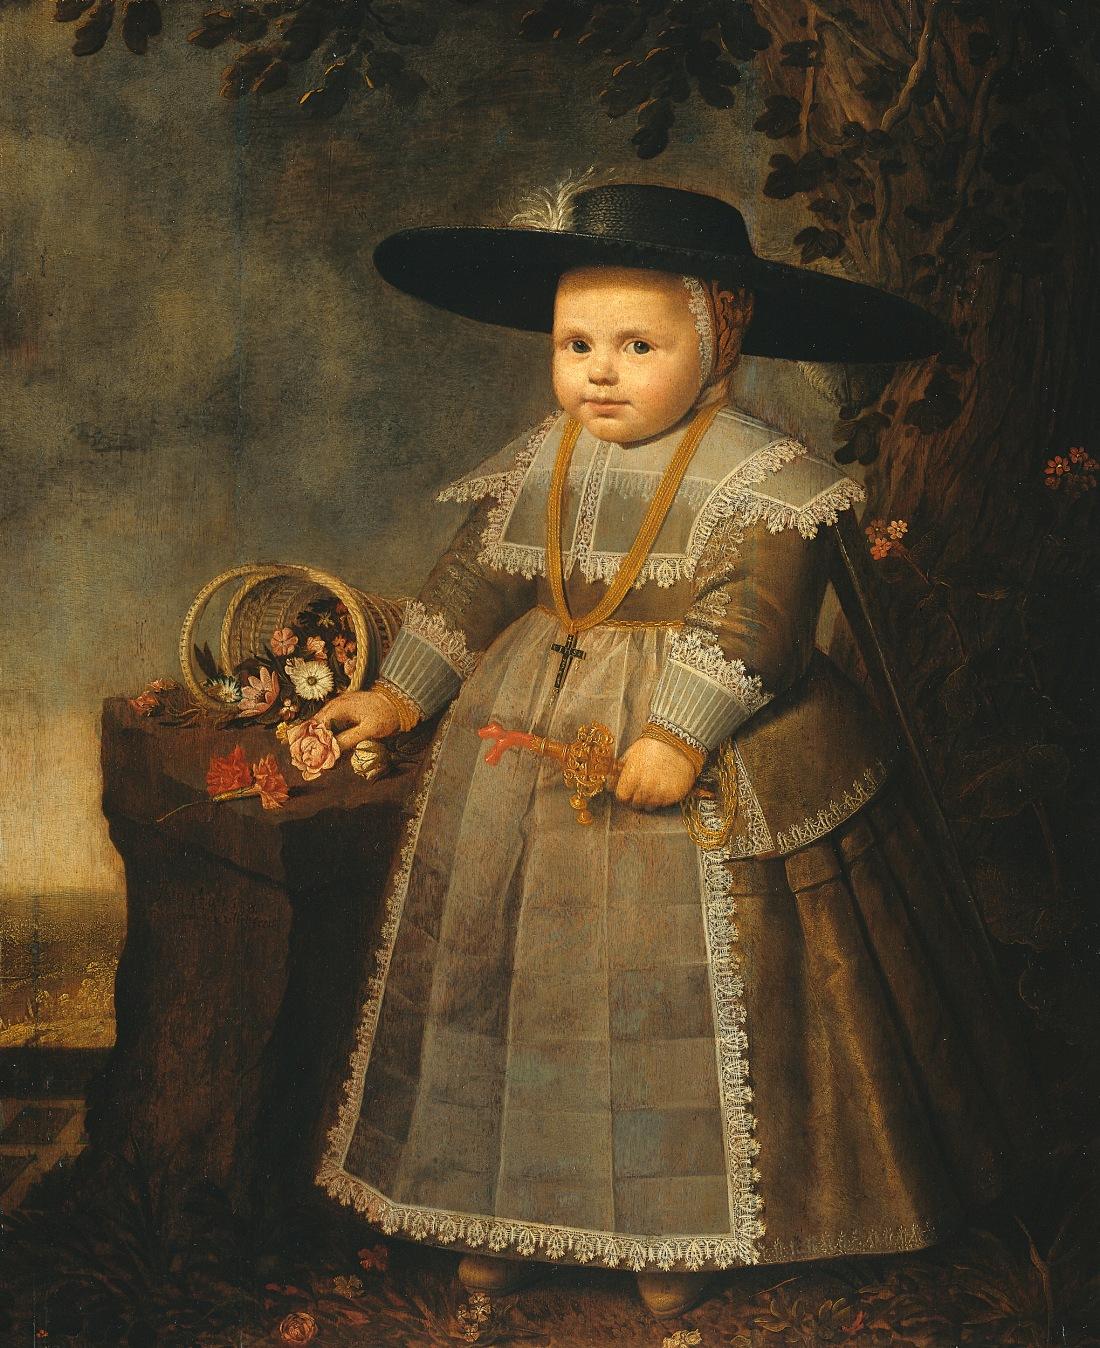 Portrait of Michiel van der Dussen. 17th c. Dutch.